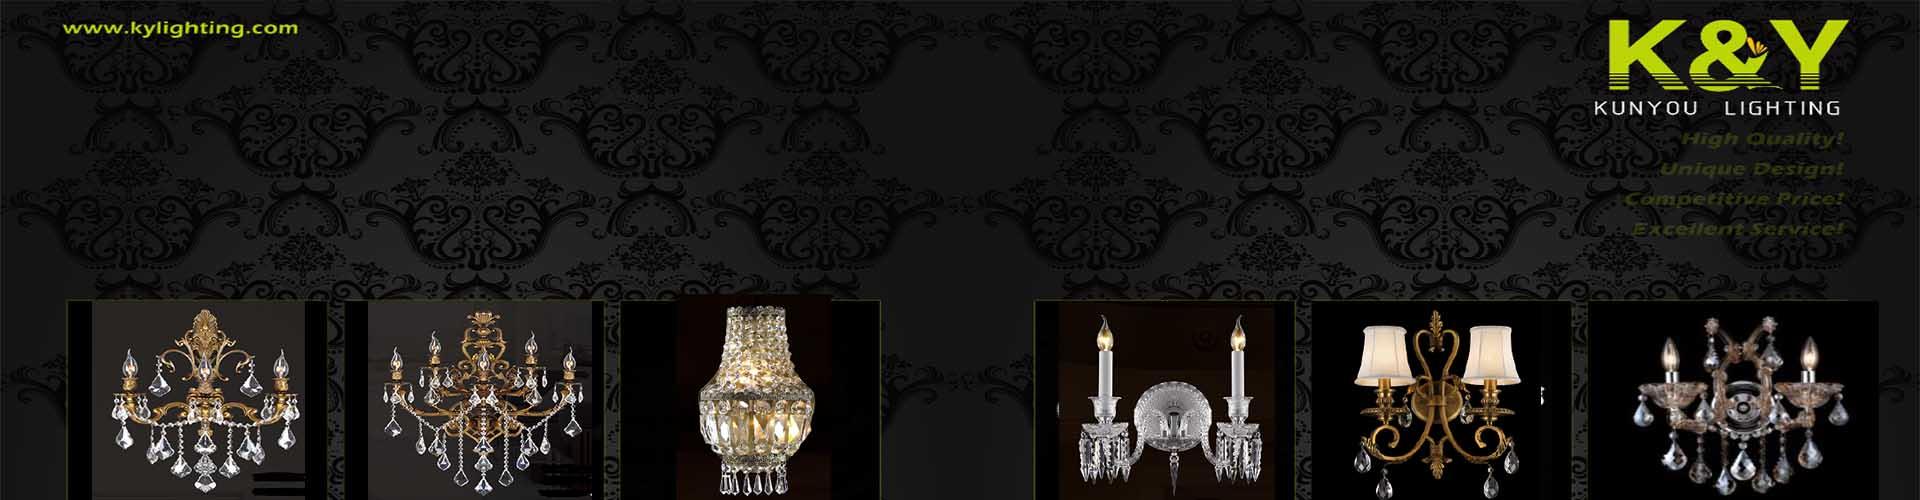 wall lamp manufacturer